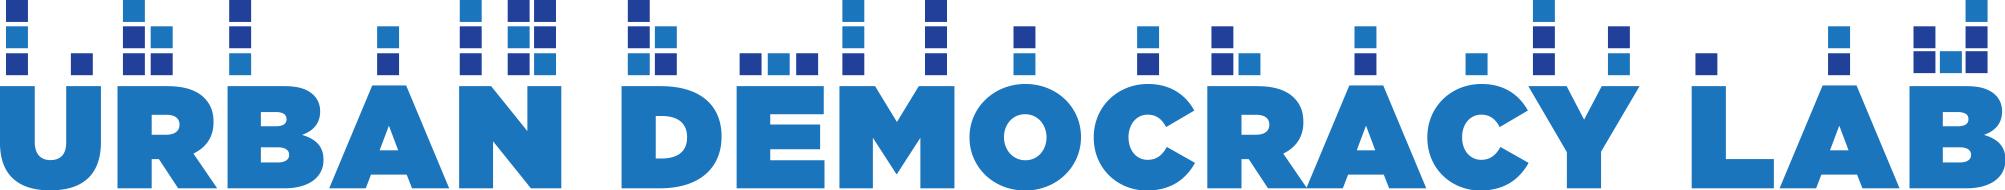 Urban Democracy Lab logo